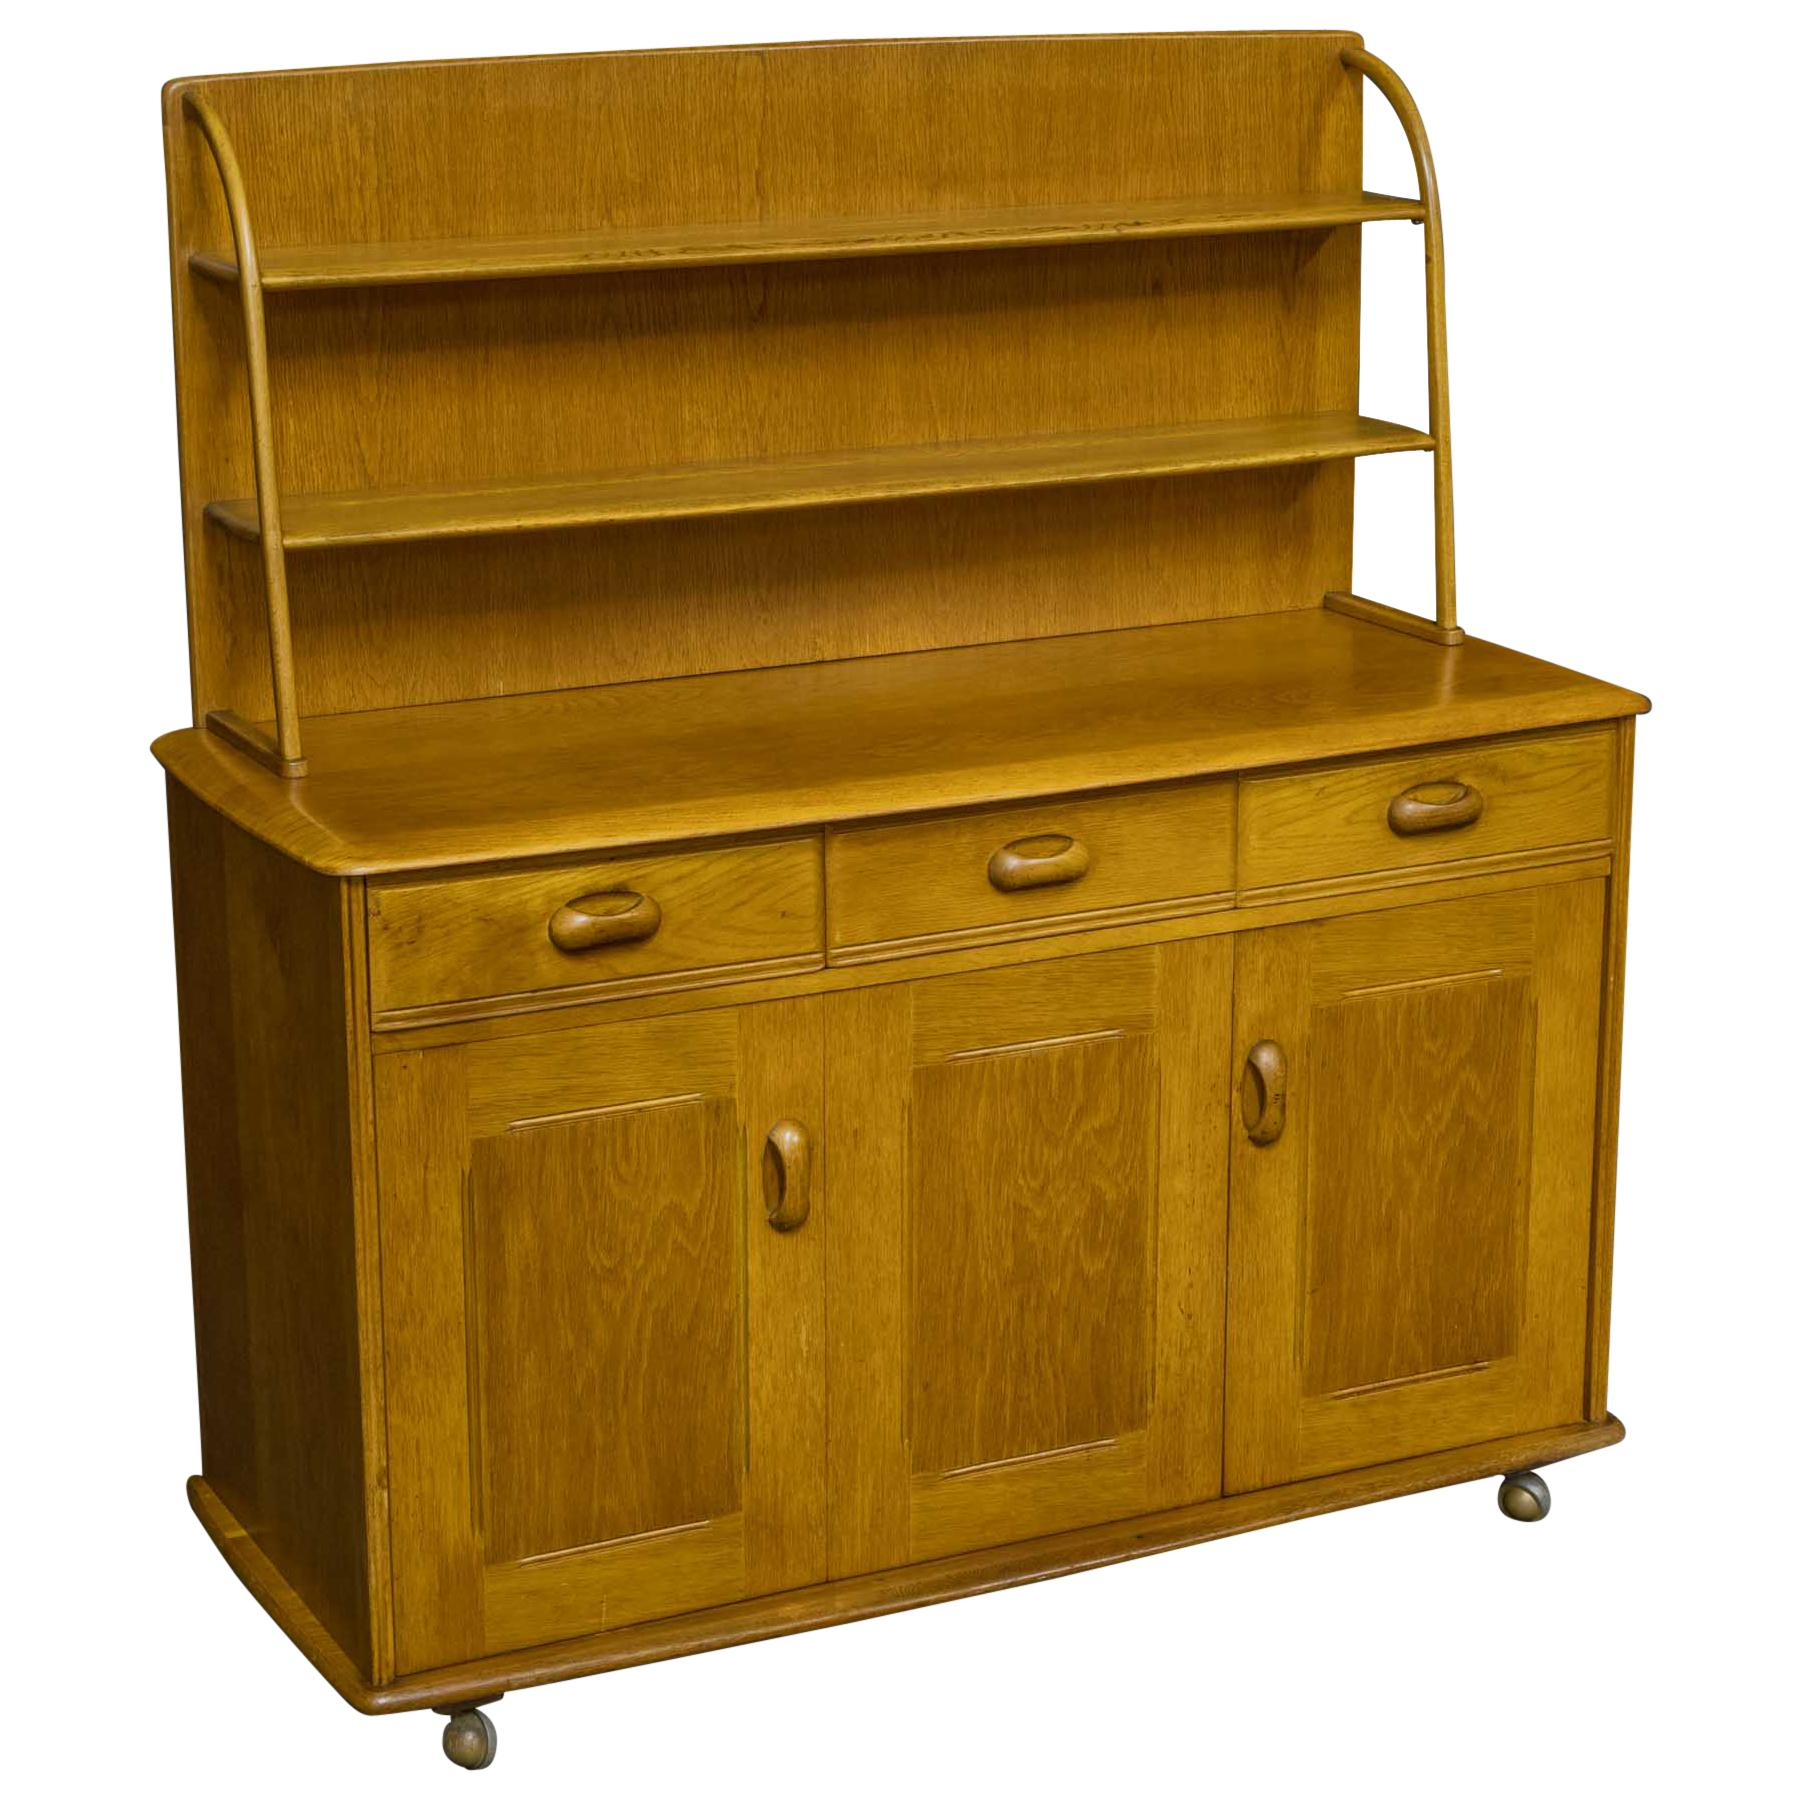 1960s Oak Priory Dresser